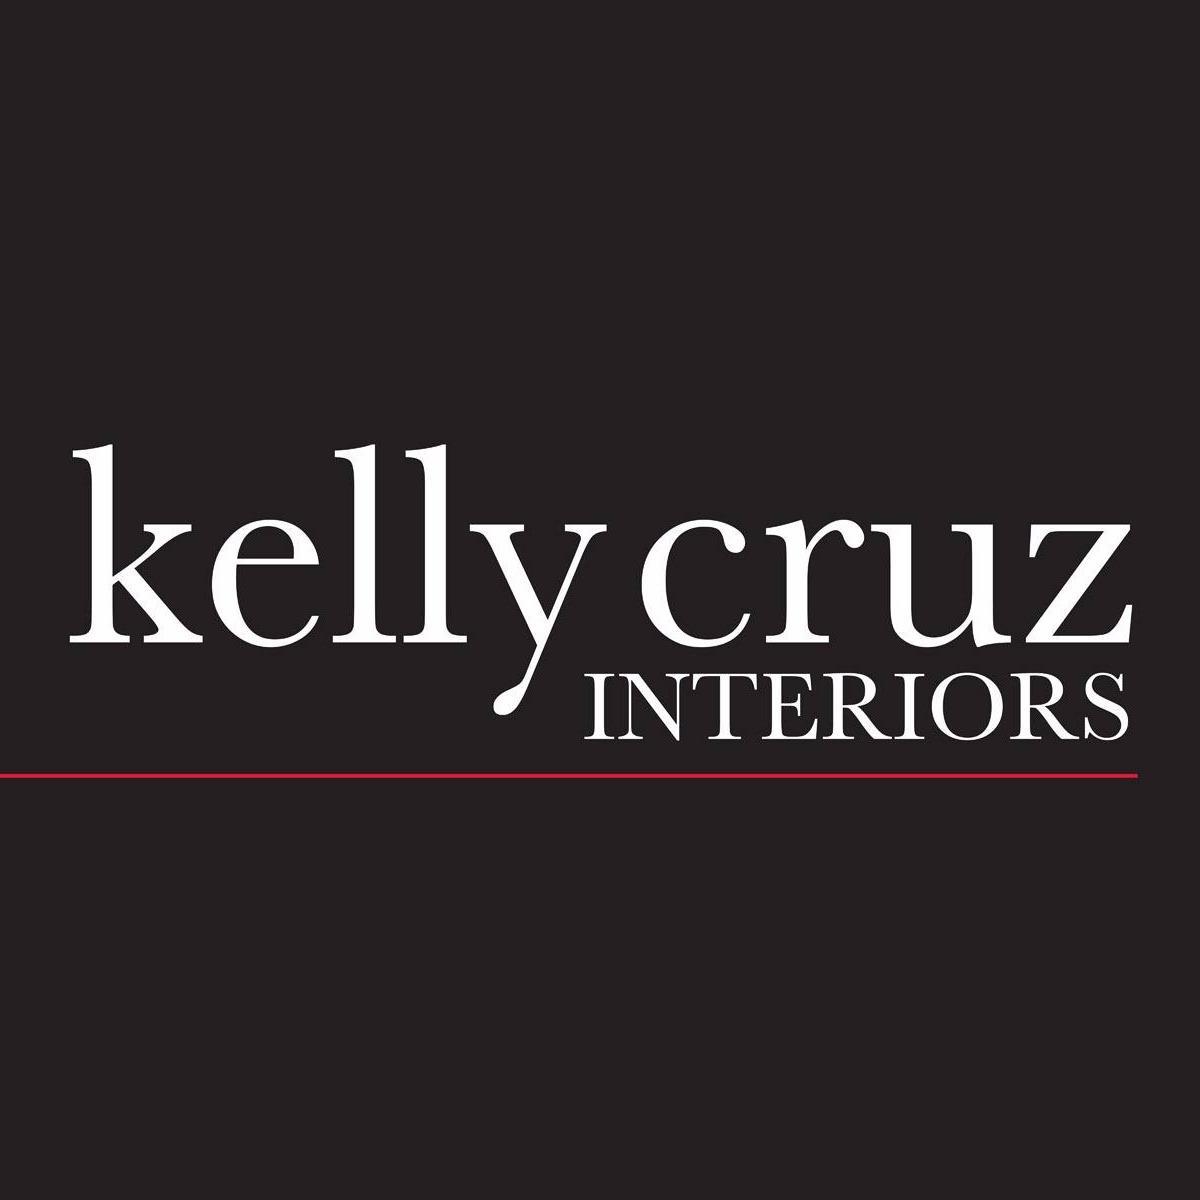 Kelly Cruz Interiors